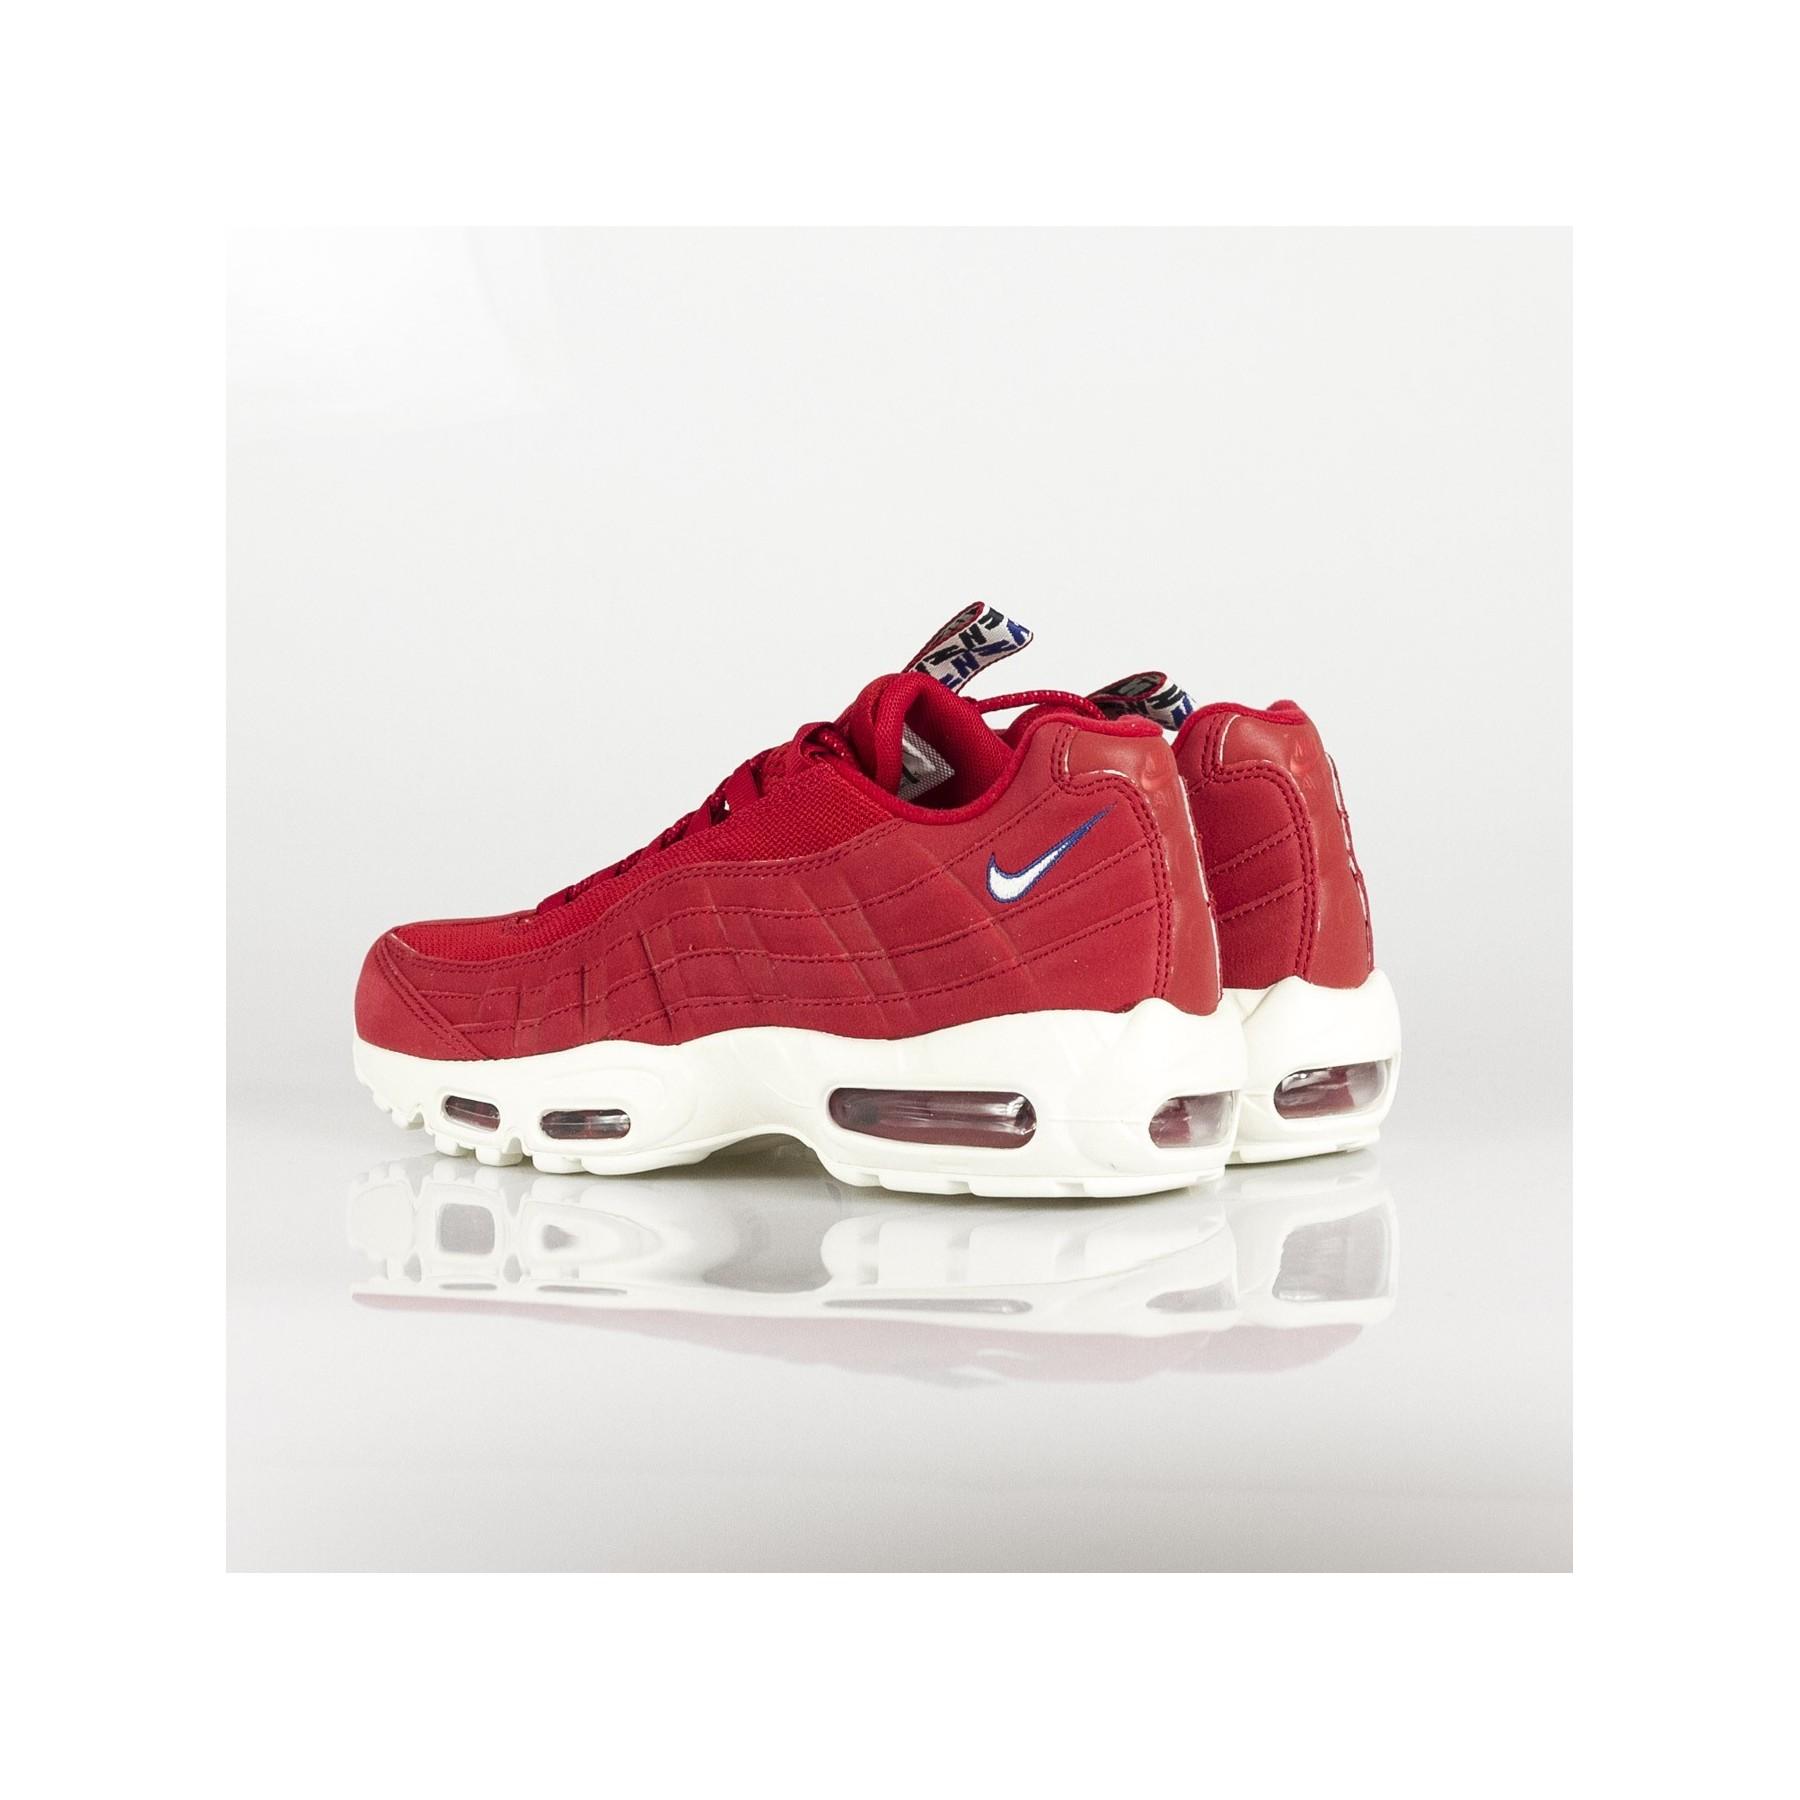 low sneaker man air max 95 tt GYM RED/SAIL/GYM BLUE